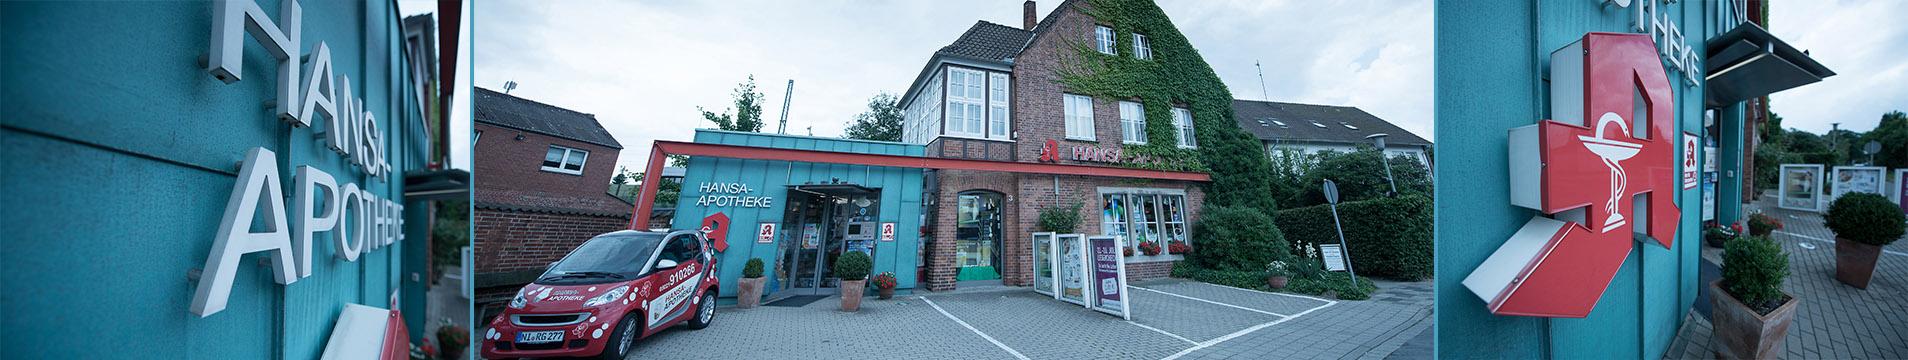 Hansa-Apotheke Nienburg